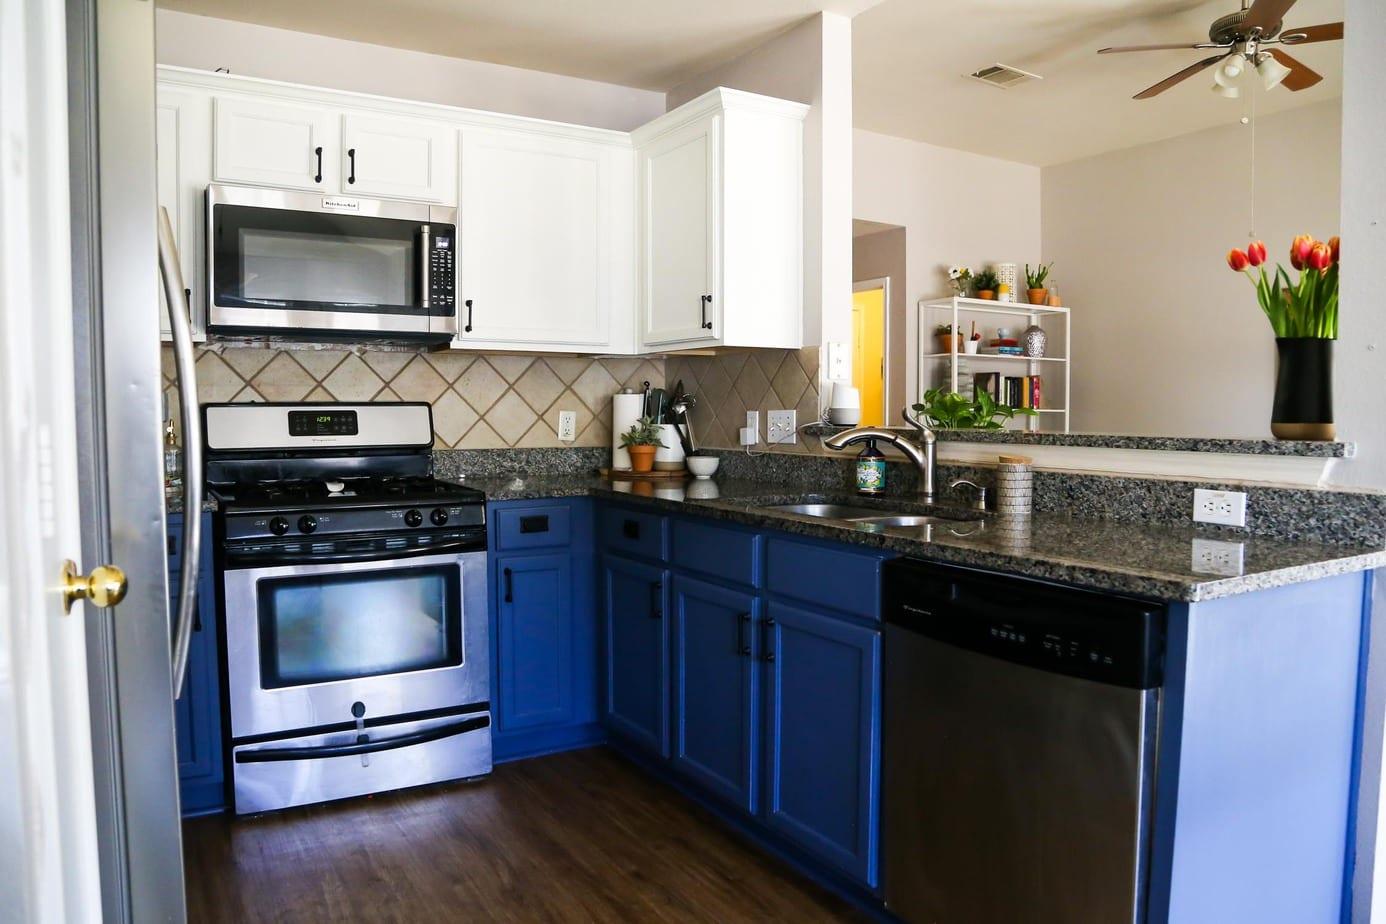 Cool L-shaped kitchen